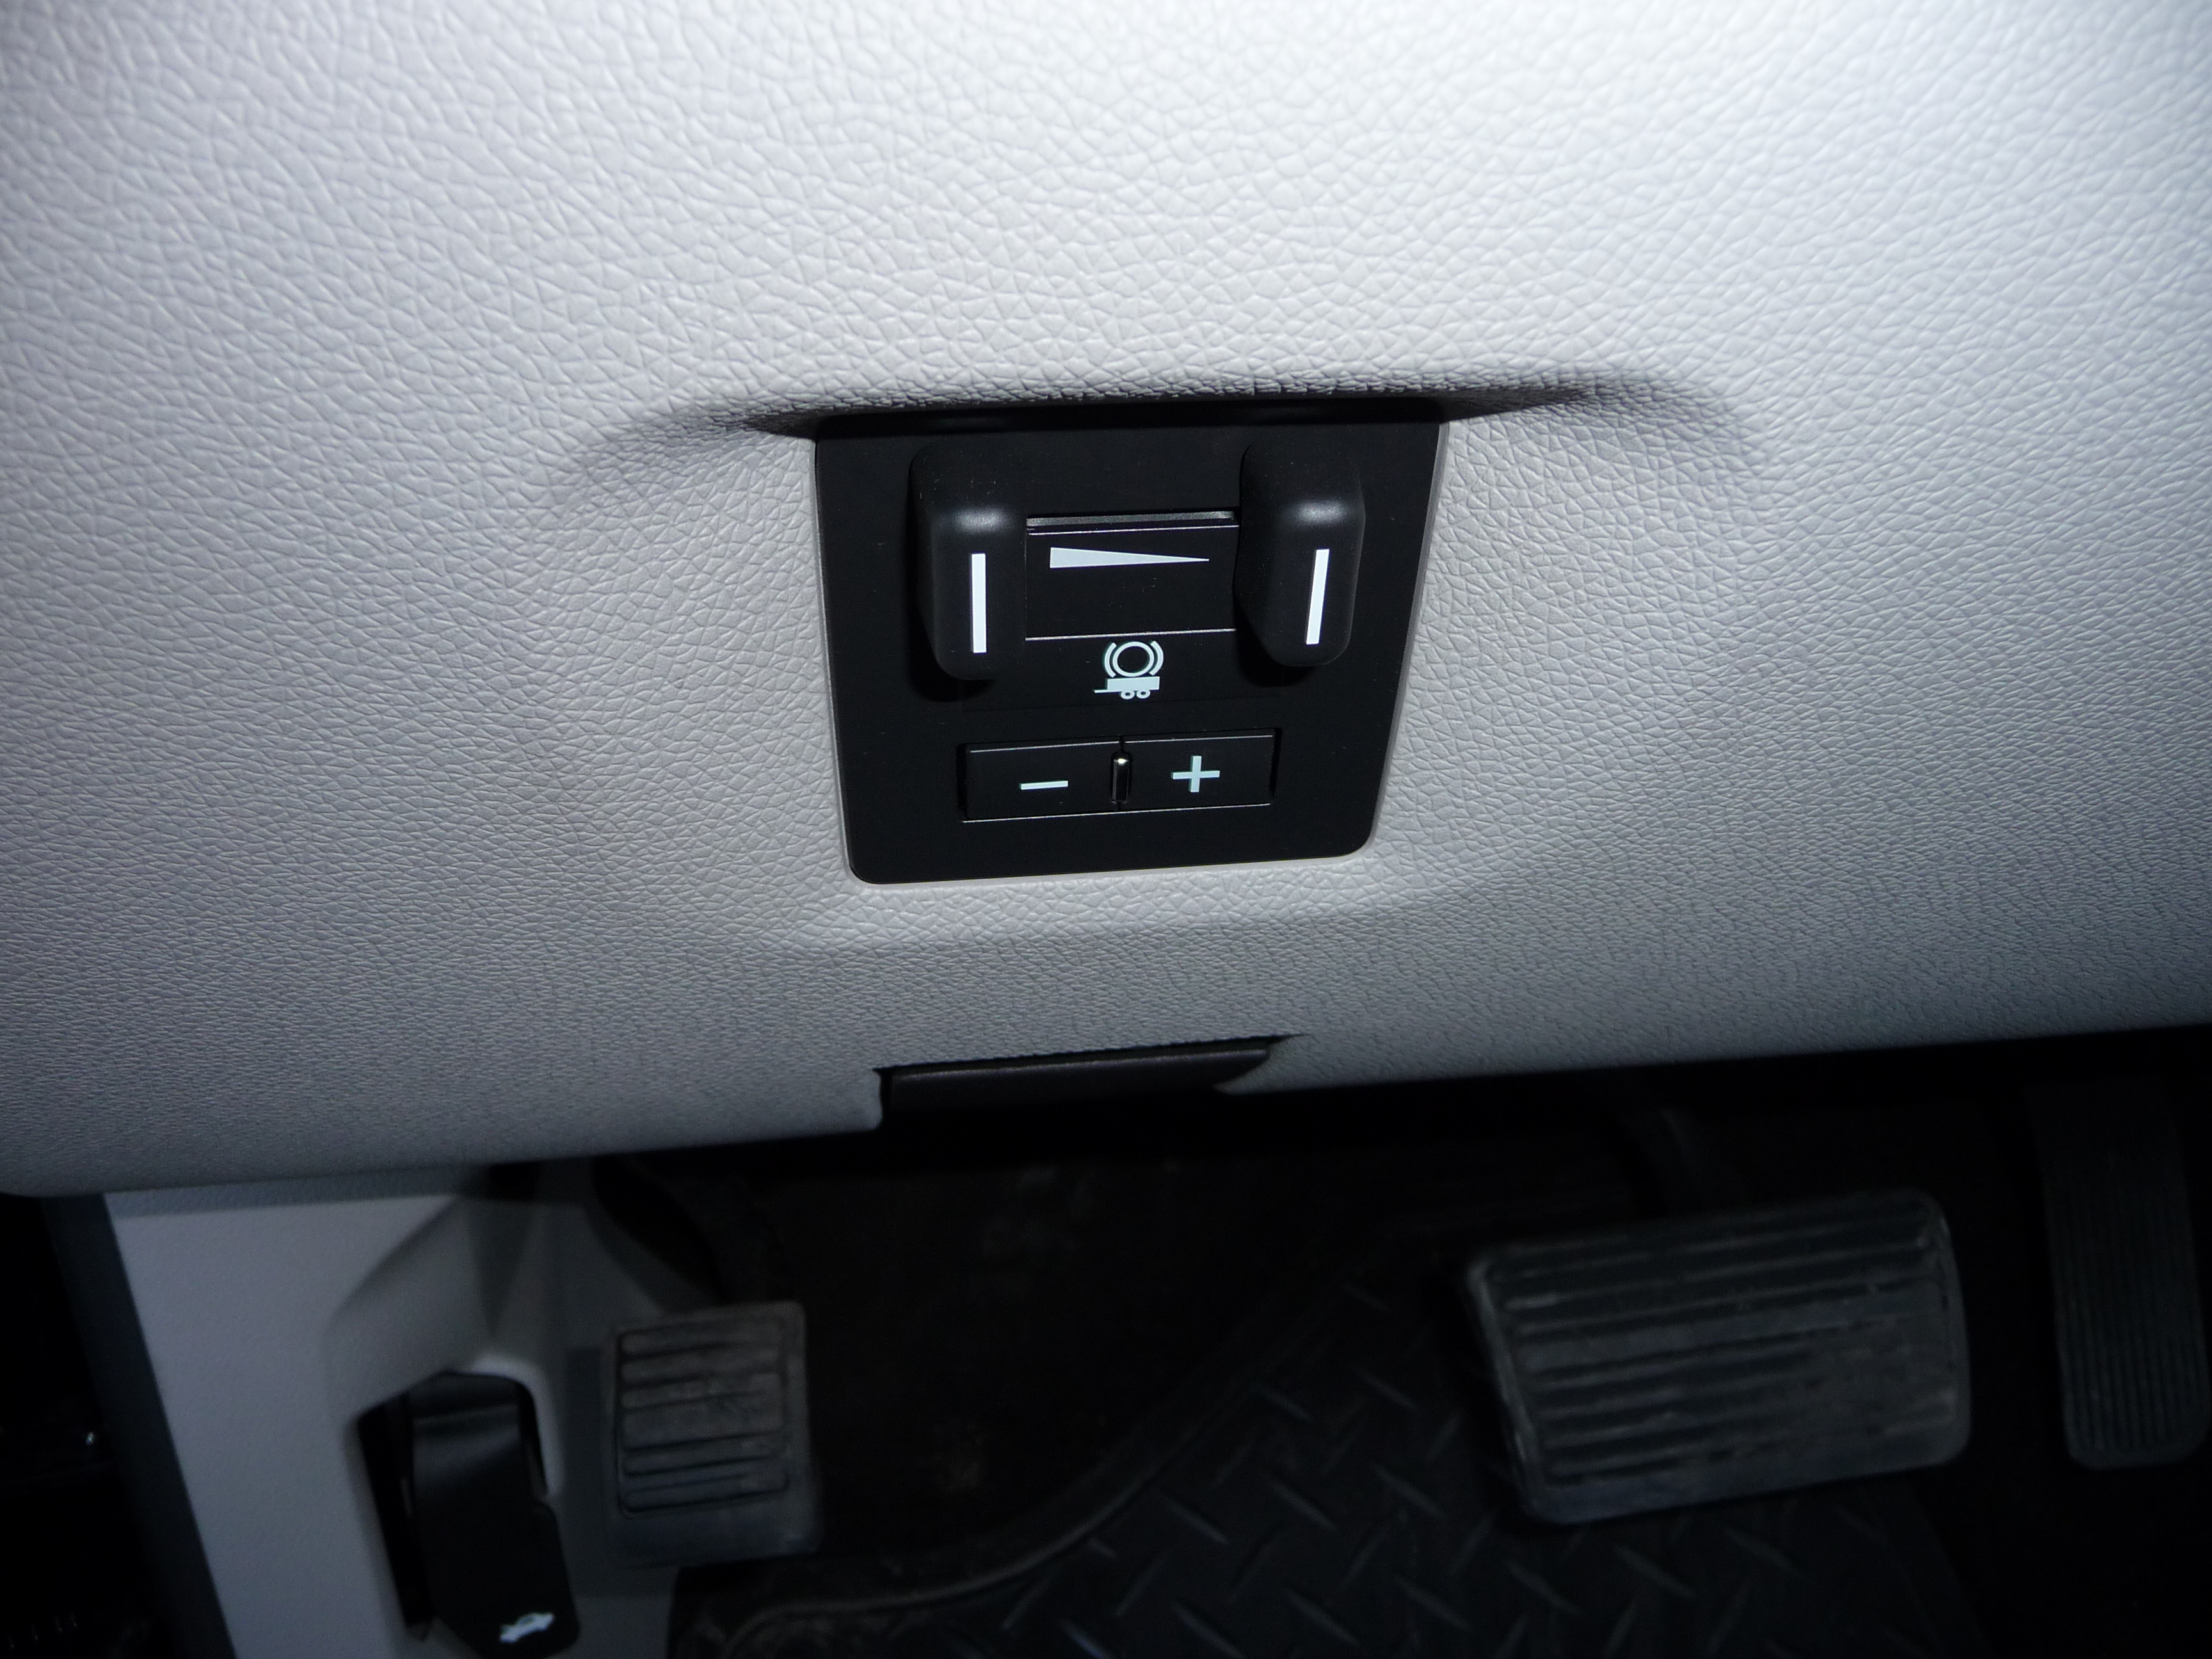 trailer brake warning chevy silverado gm map sensor wiring diagram 2009 1500 towing logan coach welcome to